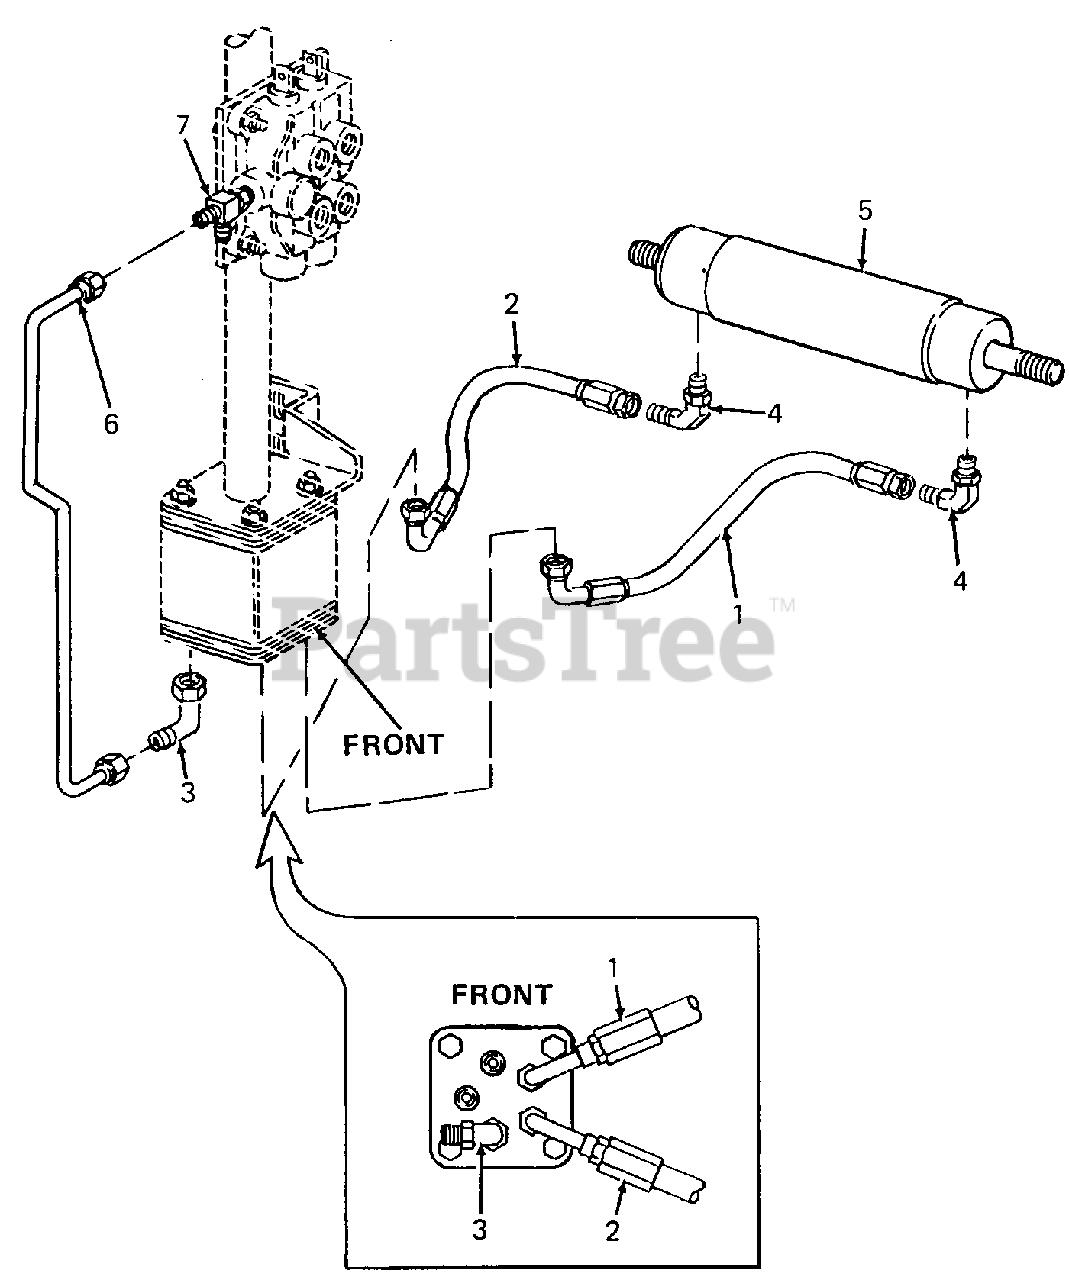 [DIAGRAM] Cub Cadet Steering Parts Diagram FULL Version HD